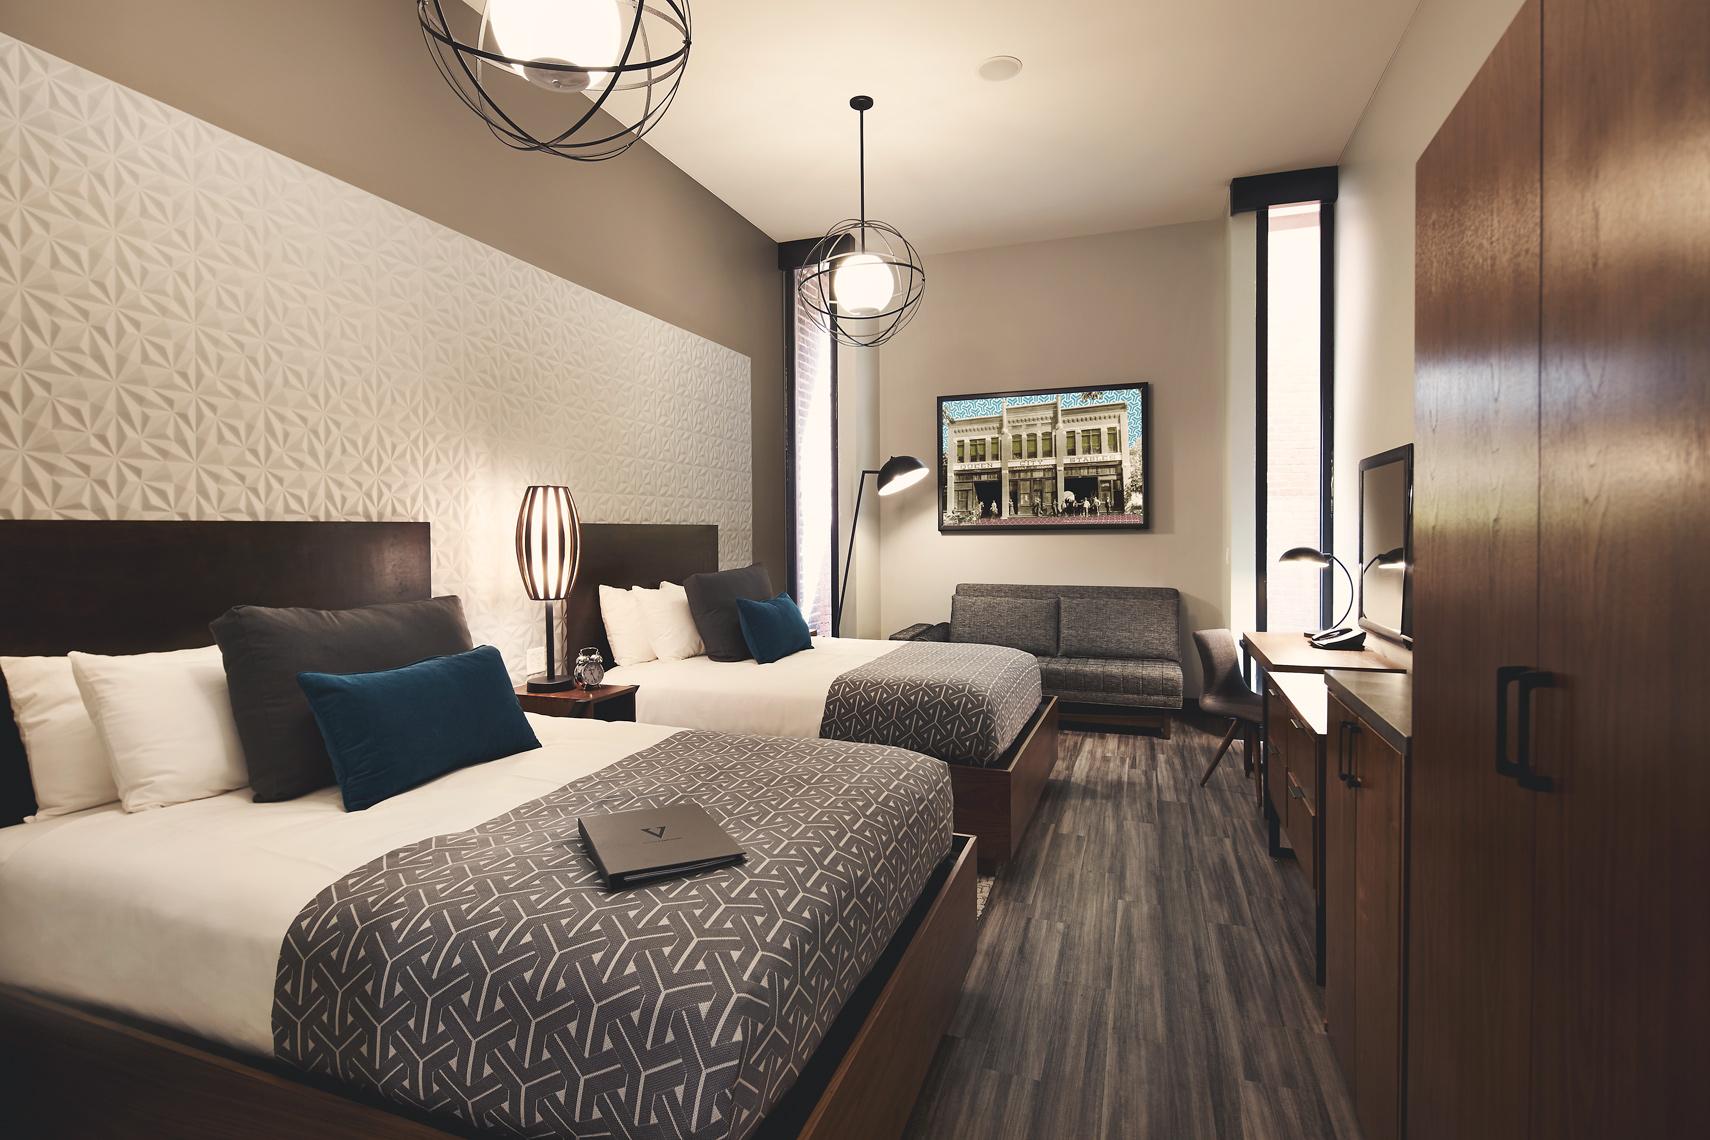 07_28_15-HotelVandivort-010.jpg